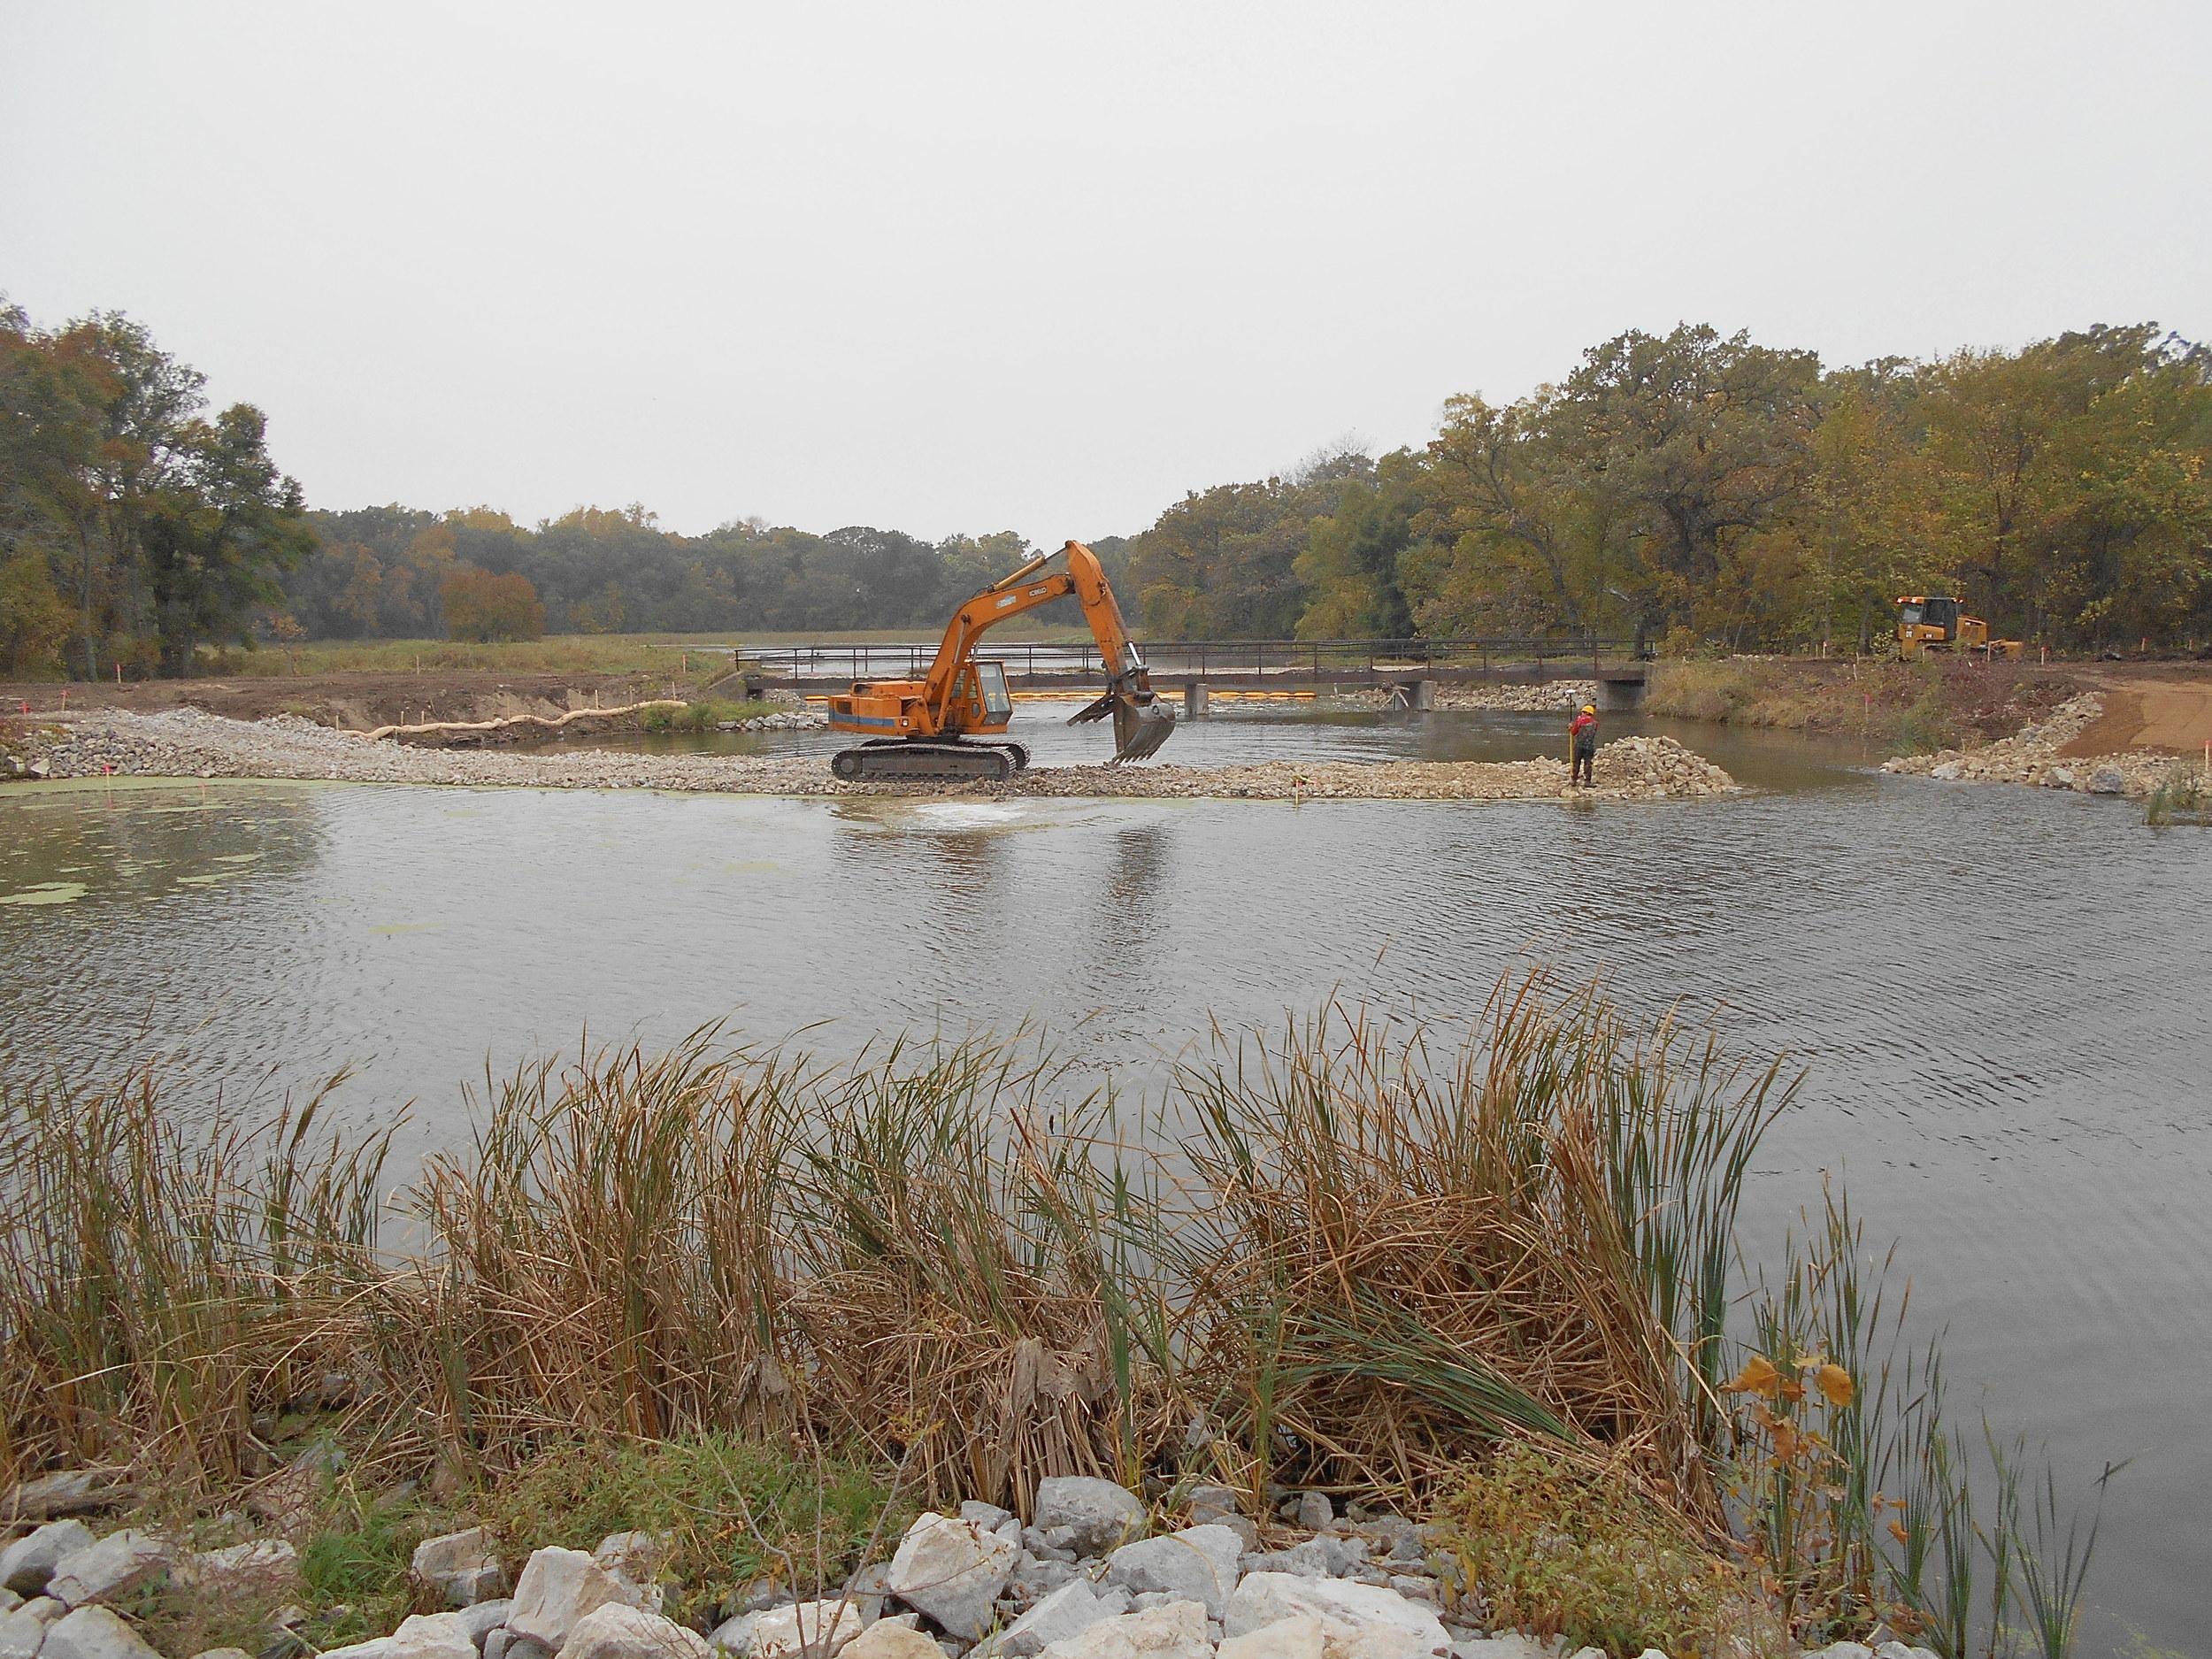 14-16 Machine on water large view.jpg